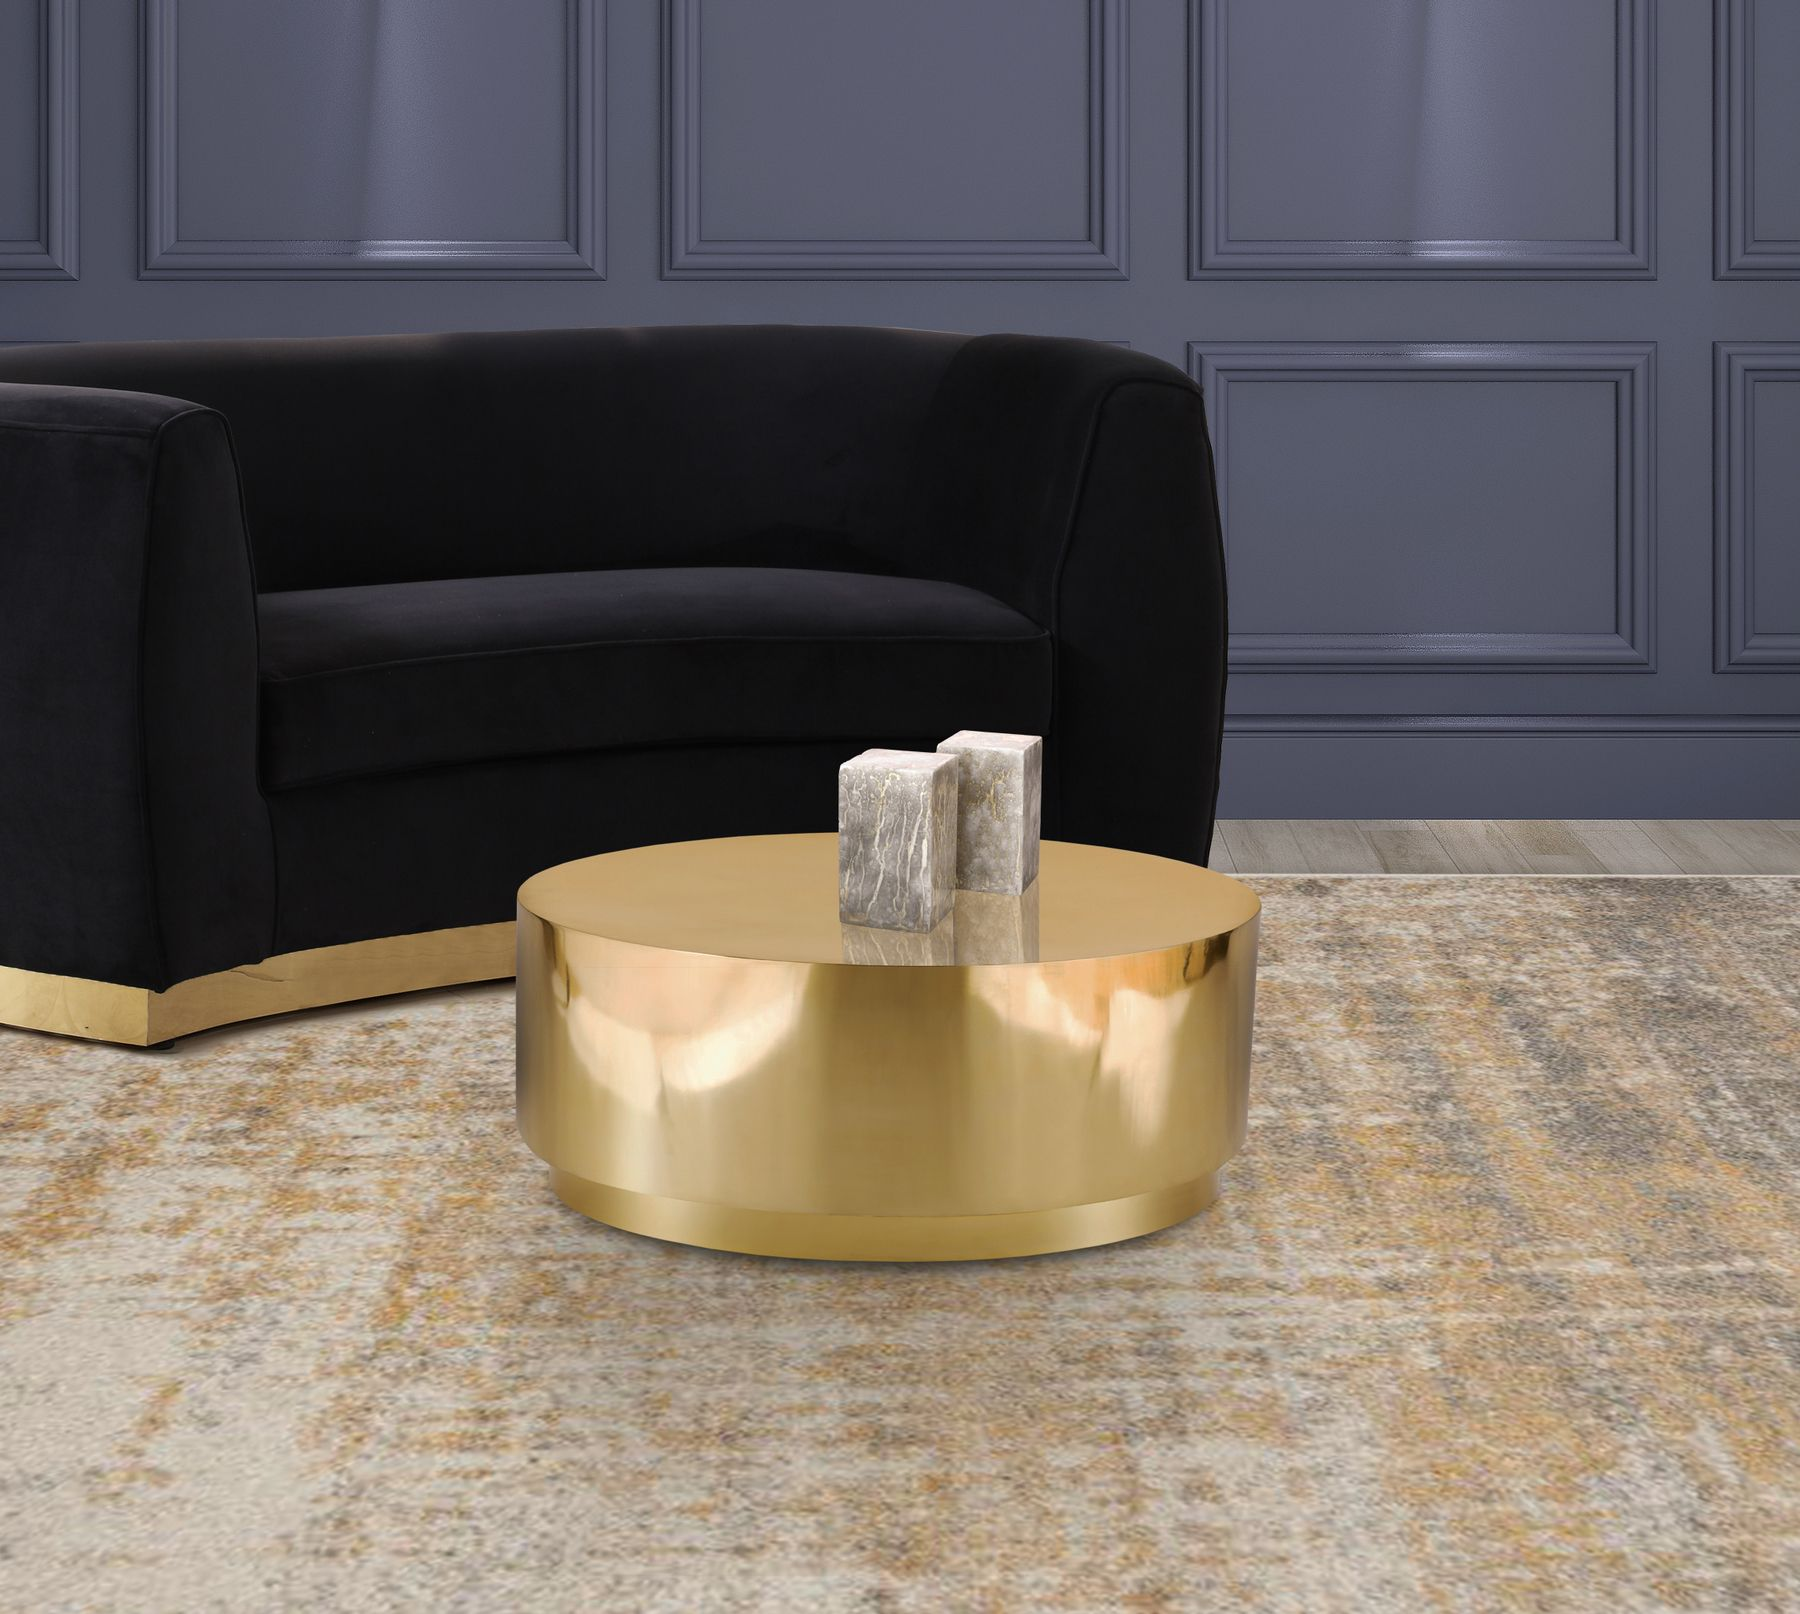 Jazzy Coffee Table 281 Meridian Furniture Coffee Tables In 2021 Gold Coffee Table Coffee Table Meridian Furniture [ 1614 x 1800 Pixel ]